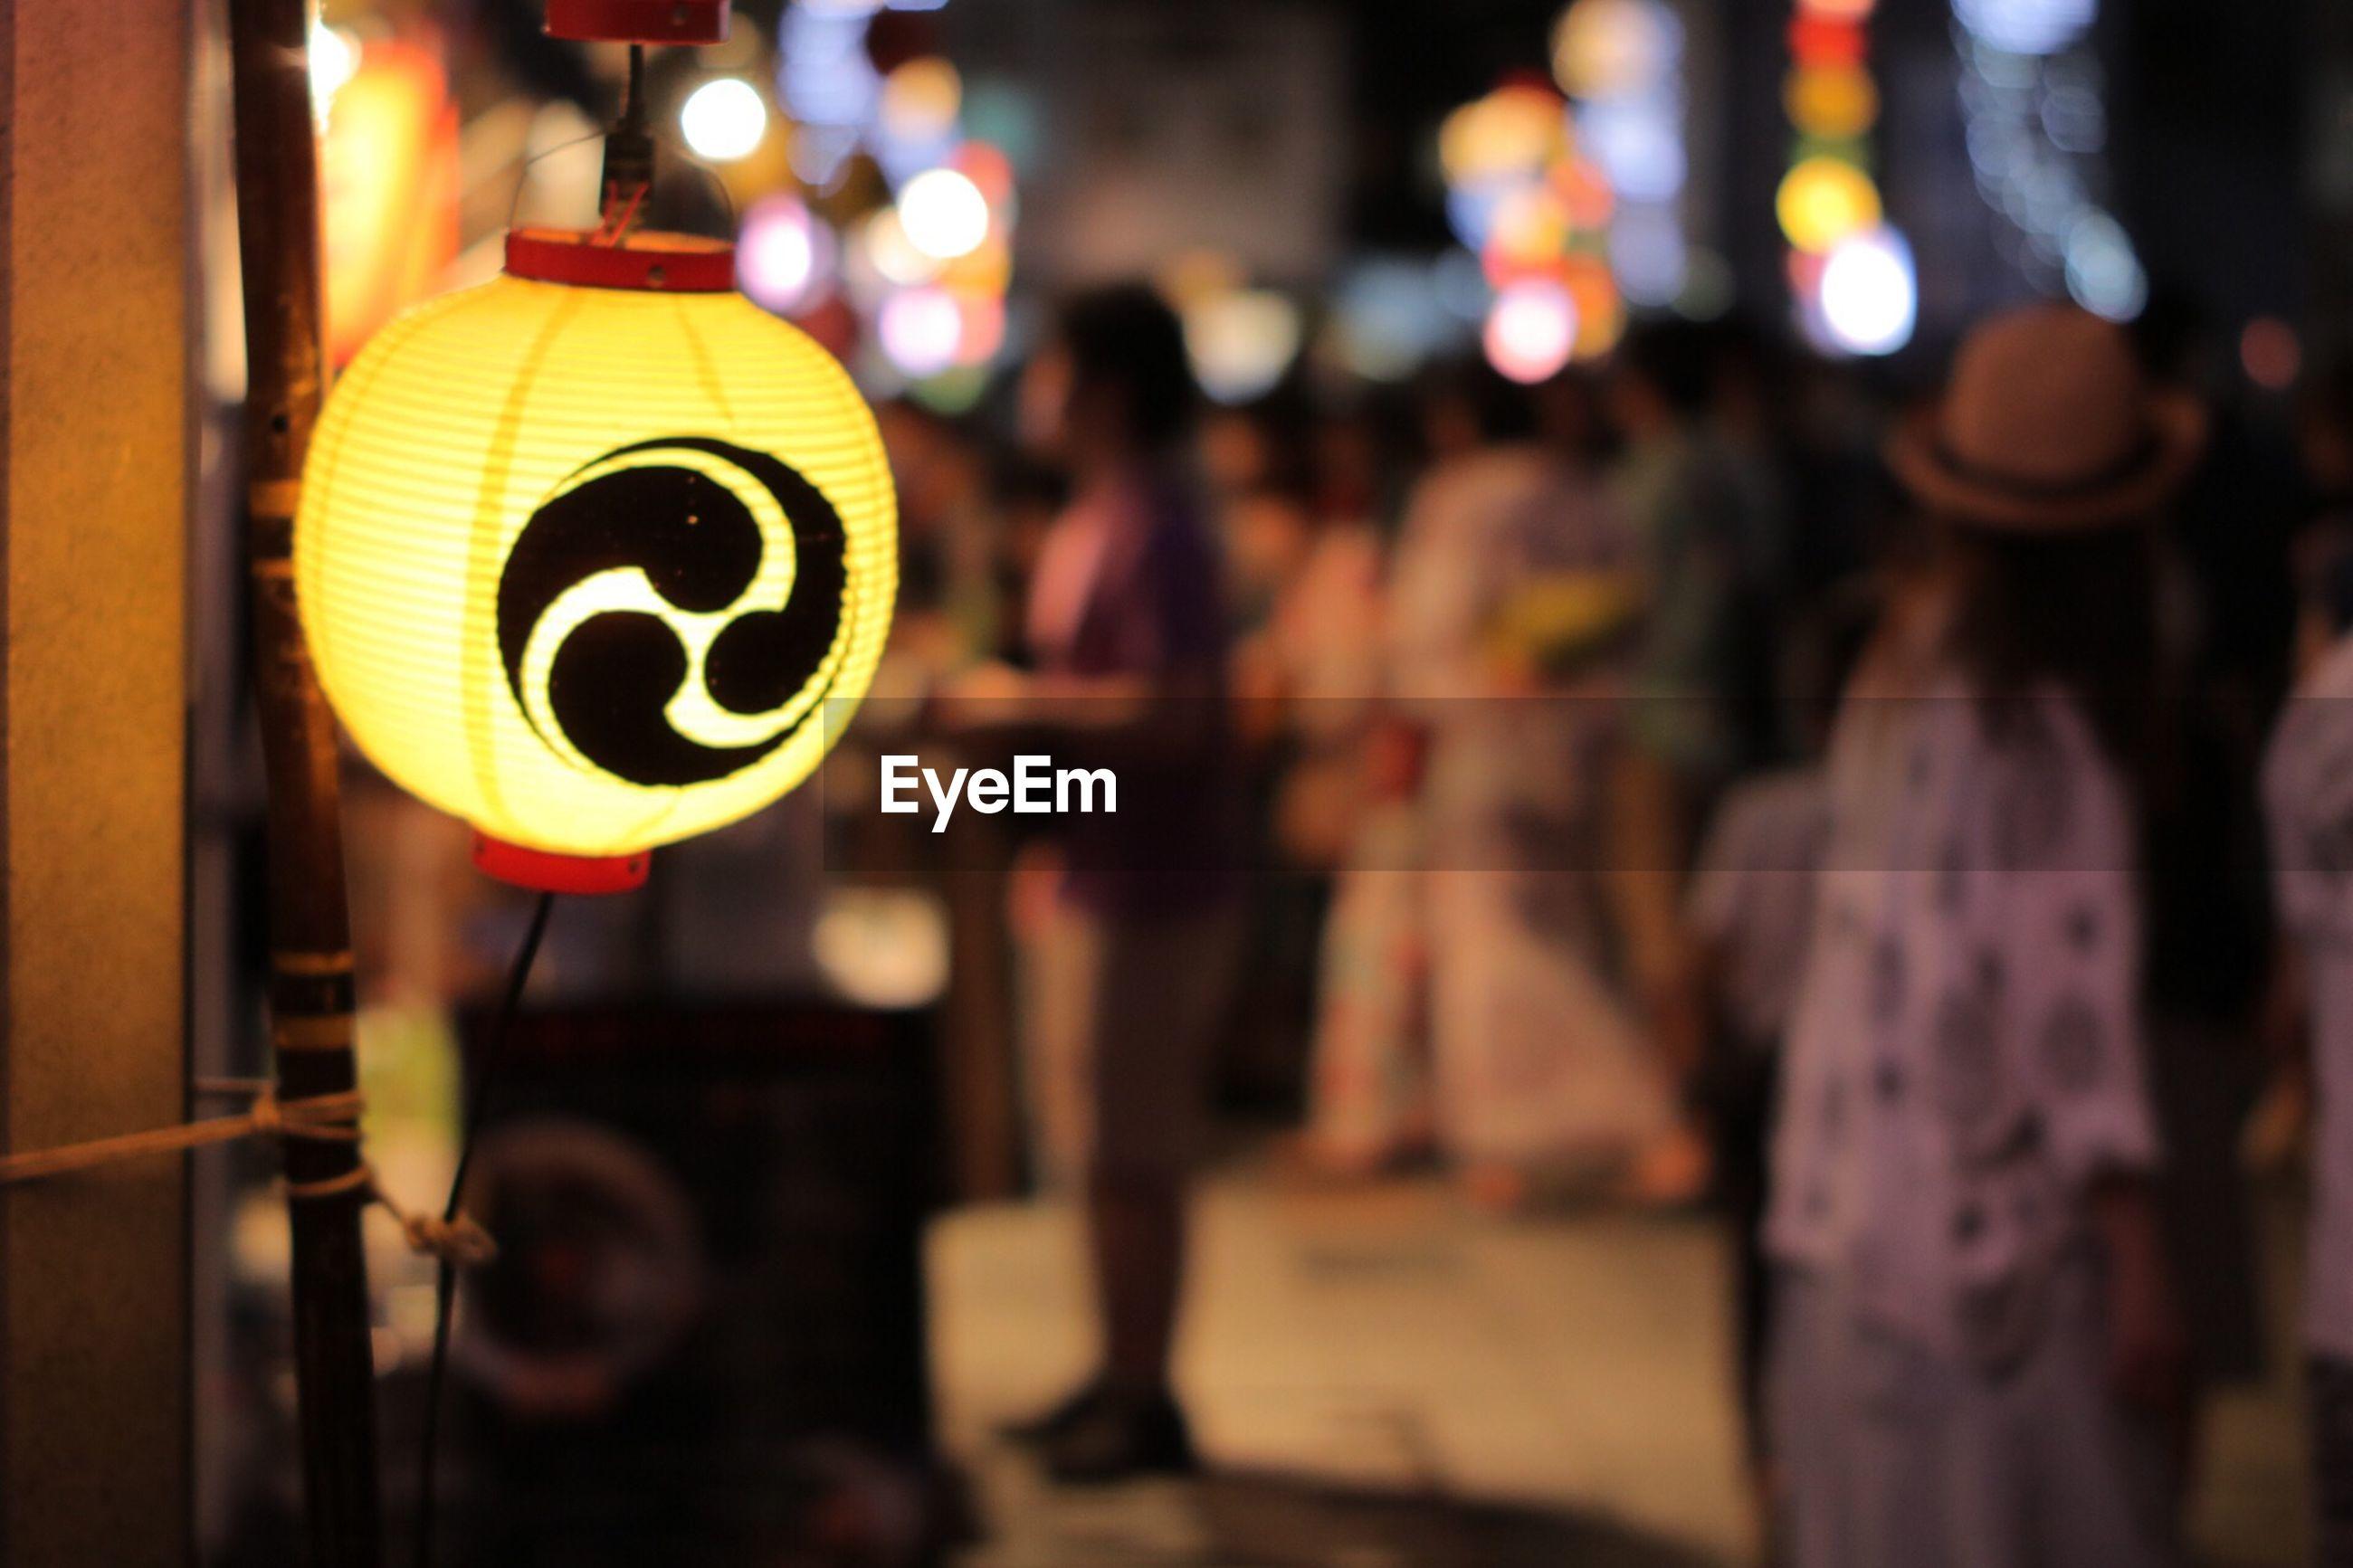 Close-up of illuminated yellow lantern on street at night